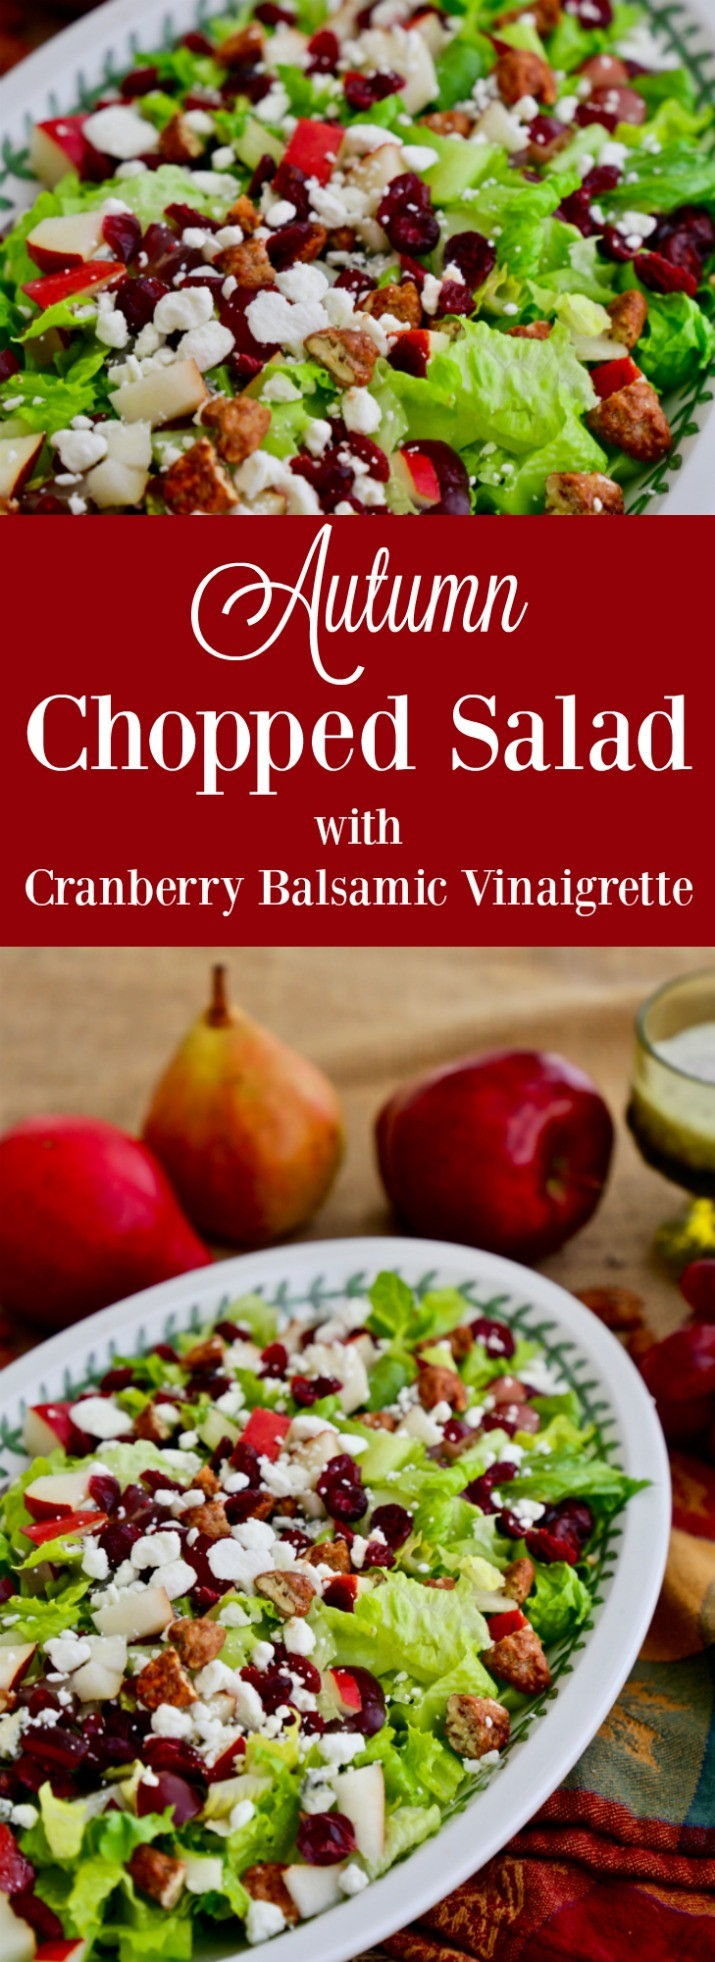 Autumn Chopped Salad with Cranberry Balsamic Vinaigrette